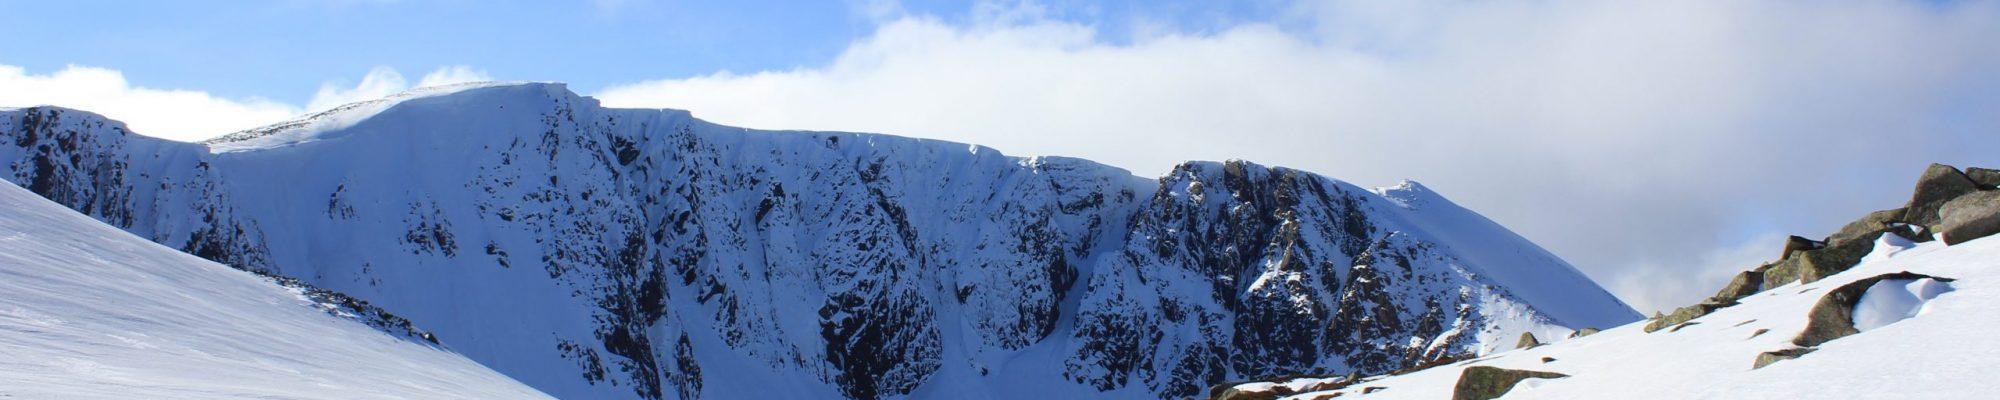 Mountaineering & Hillwalking